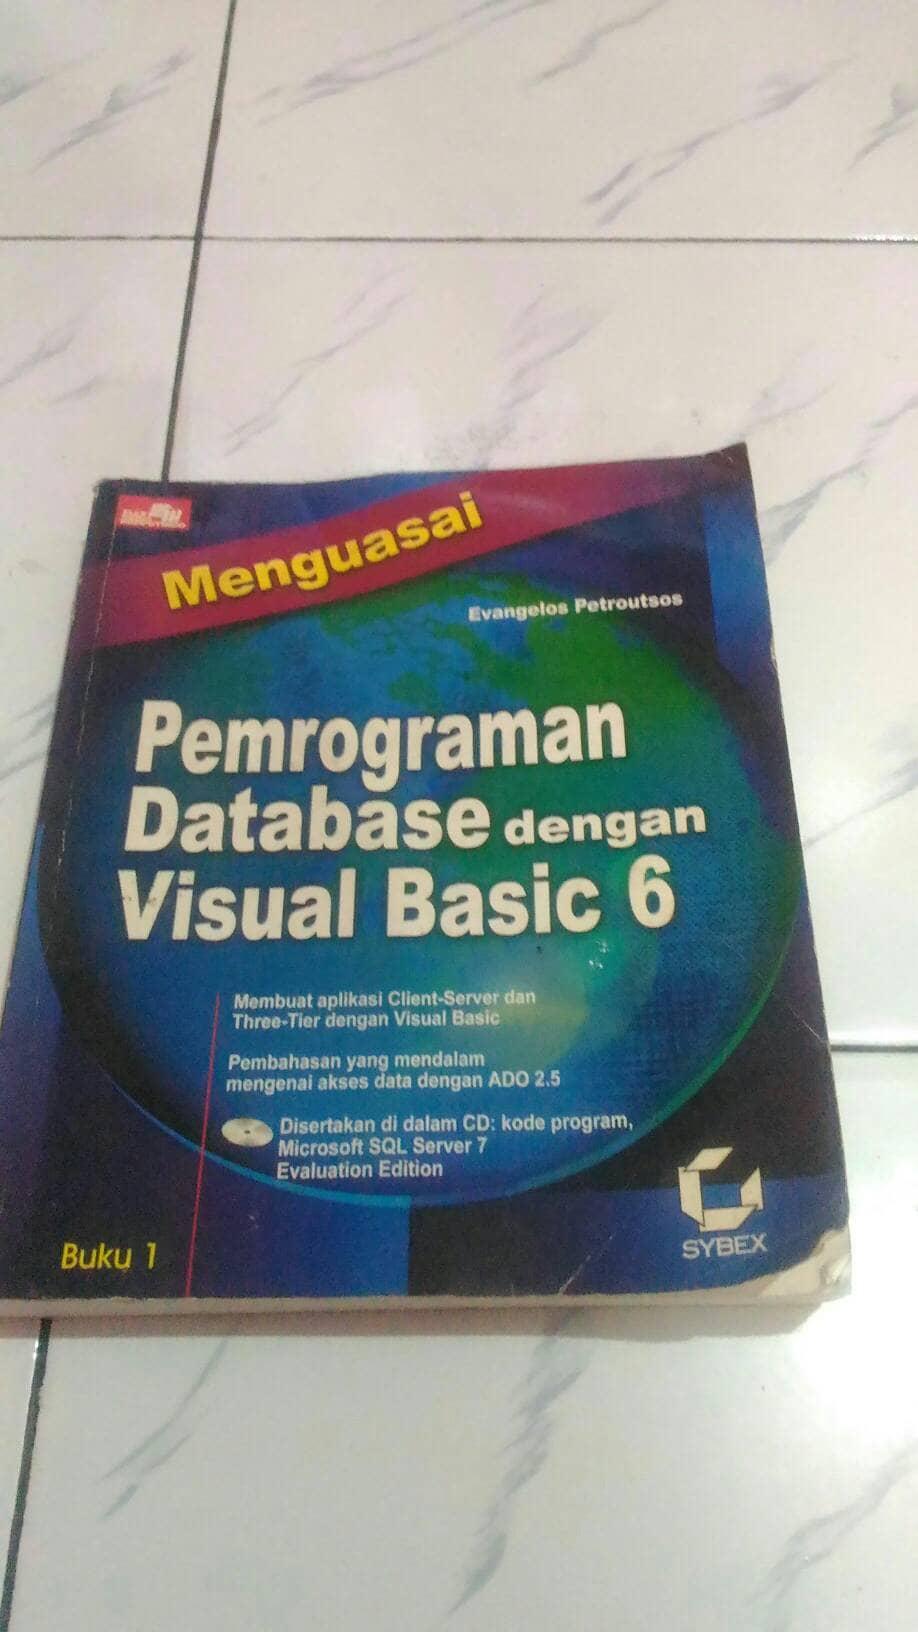 menguasai pemrograman database dengan visual basic 6